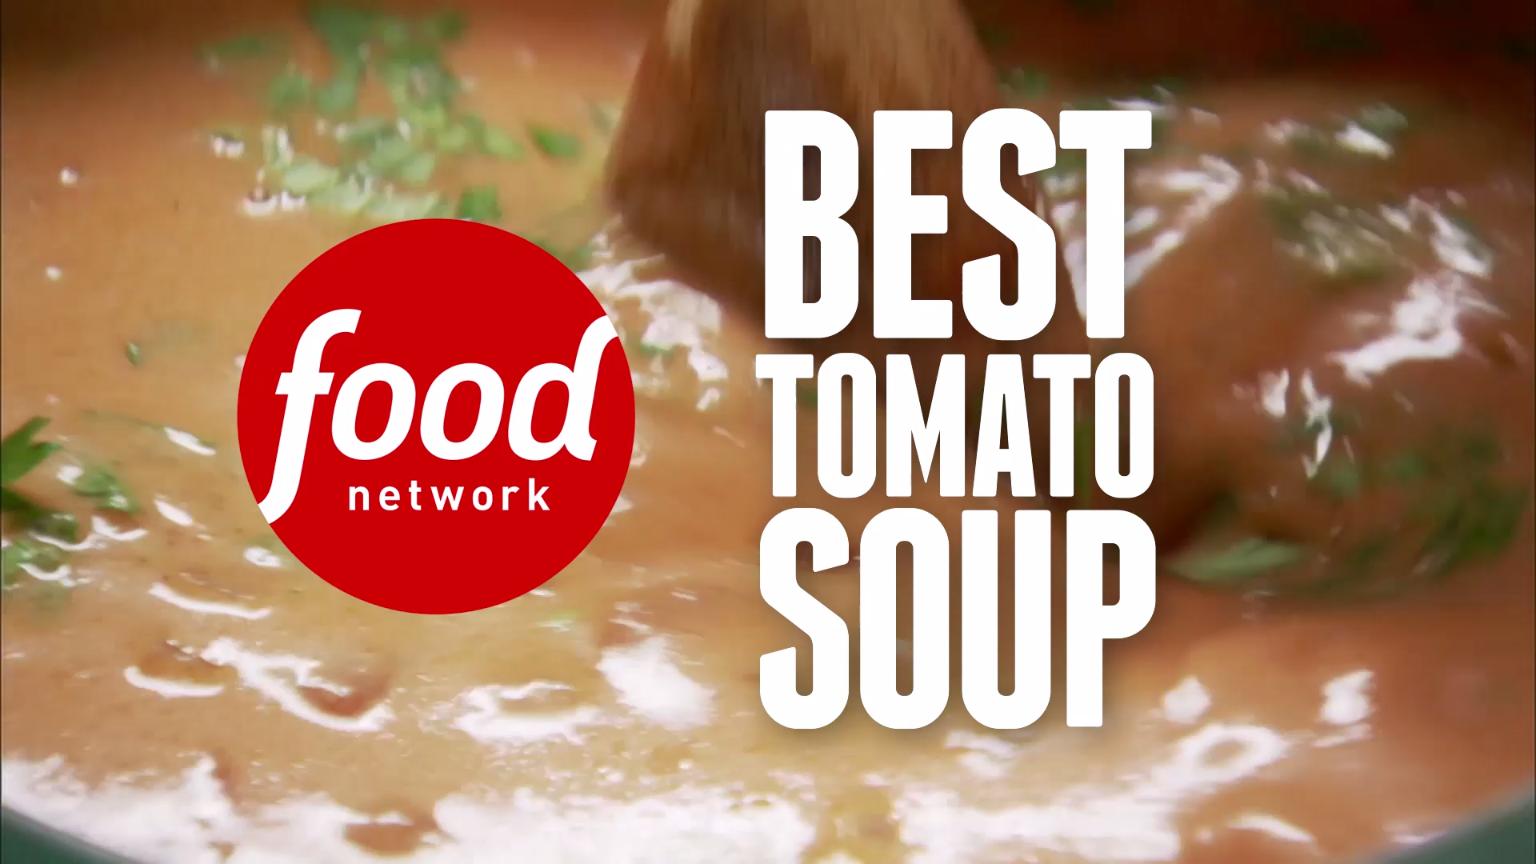 Best tomato soup ever recipe tomato juice juice and recipes best tomato soup ever forumfinder Choice Image